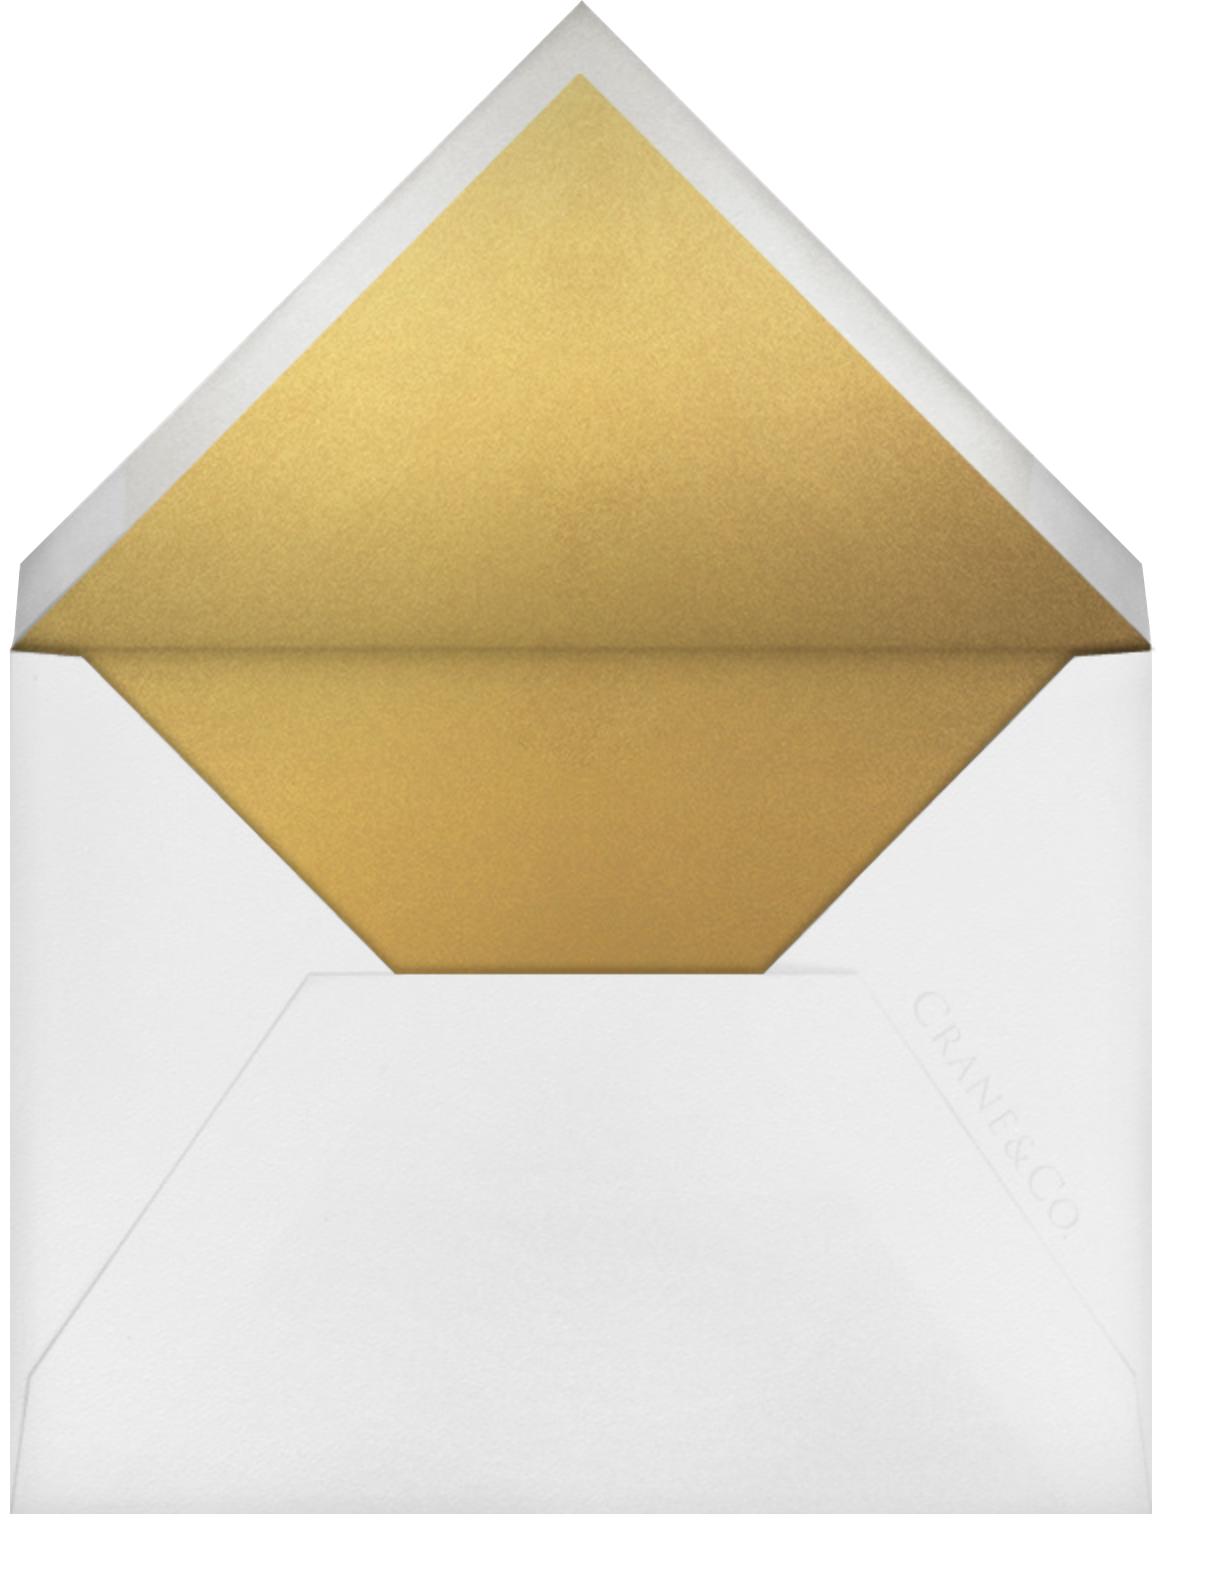 Erte (Save The Date) - Medium Gold - Crane & Co. - null - envelope back